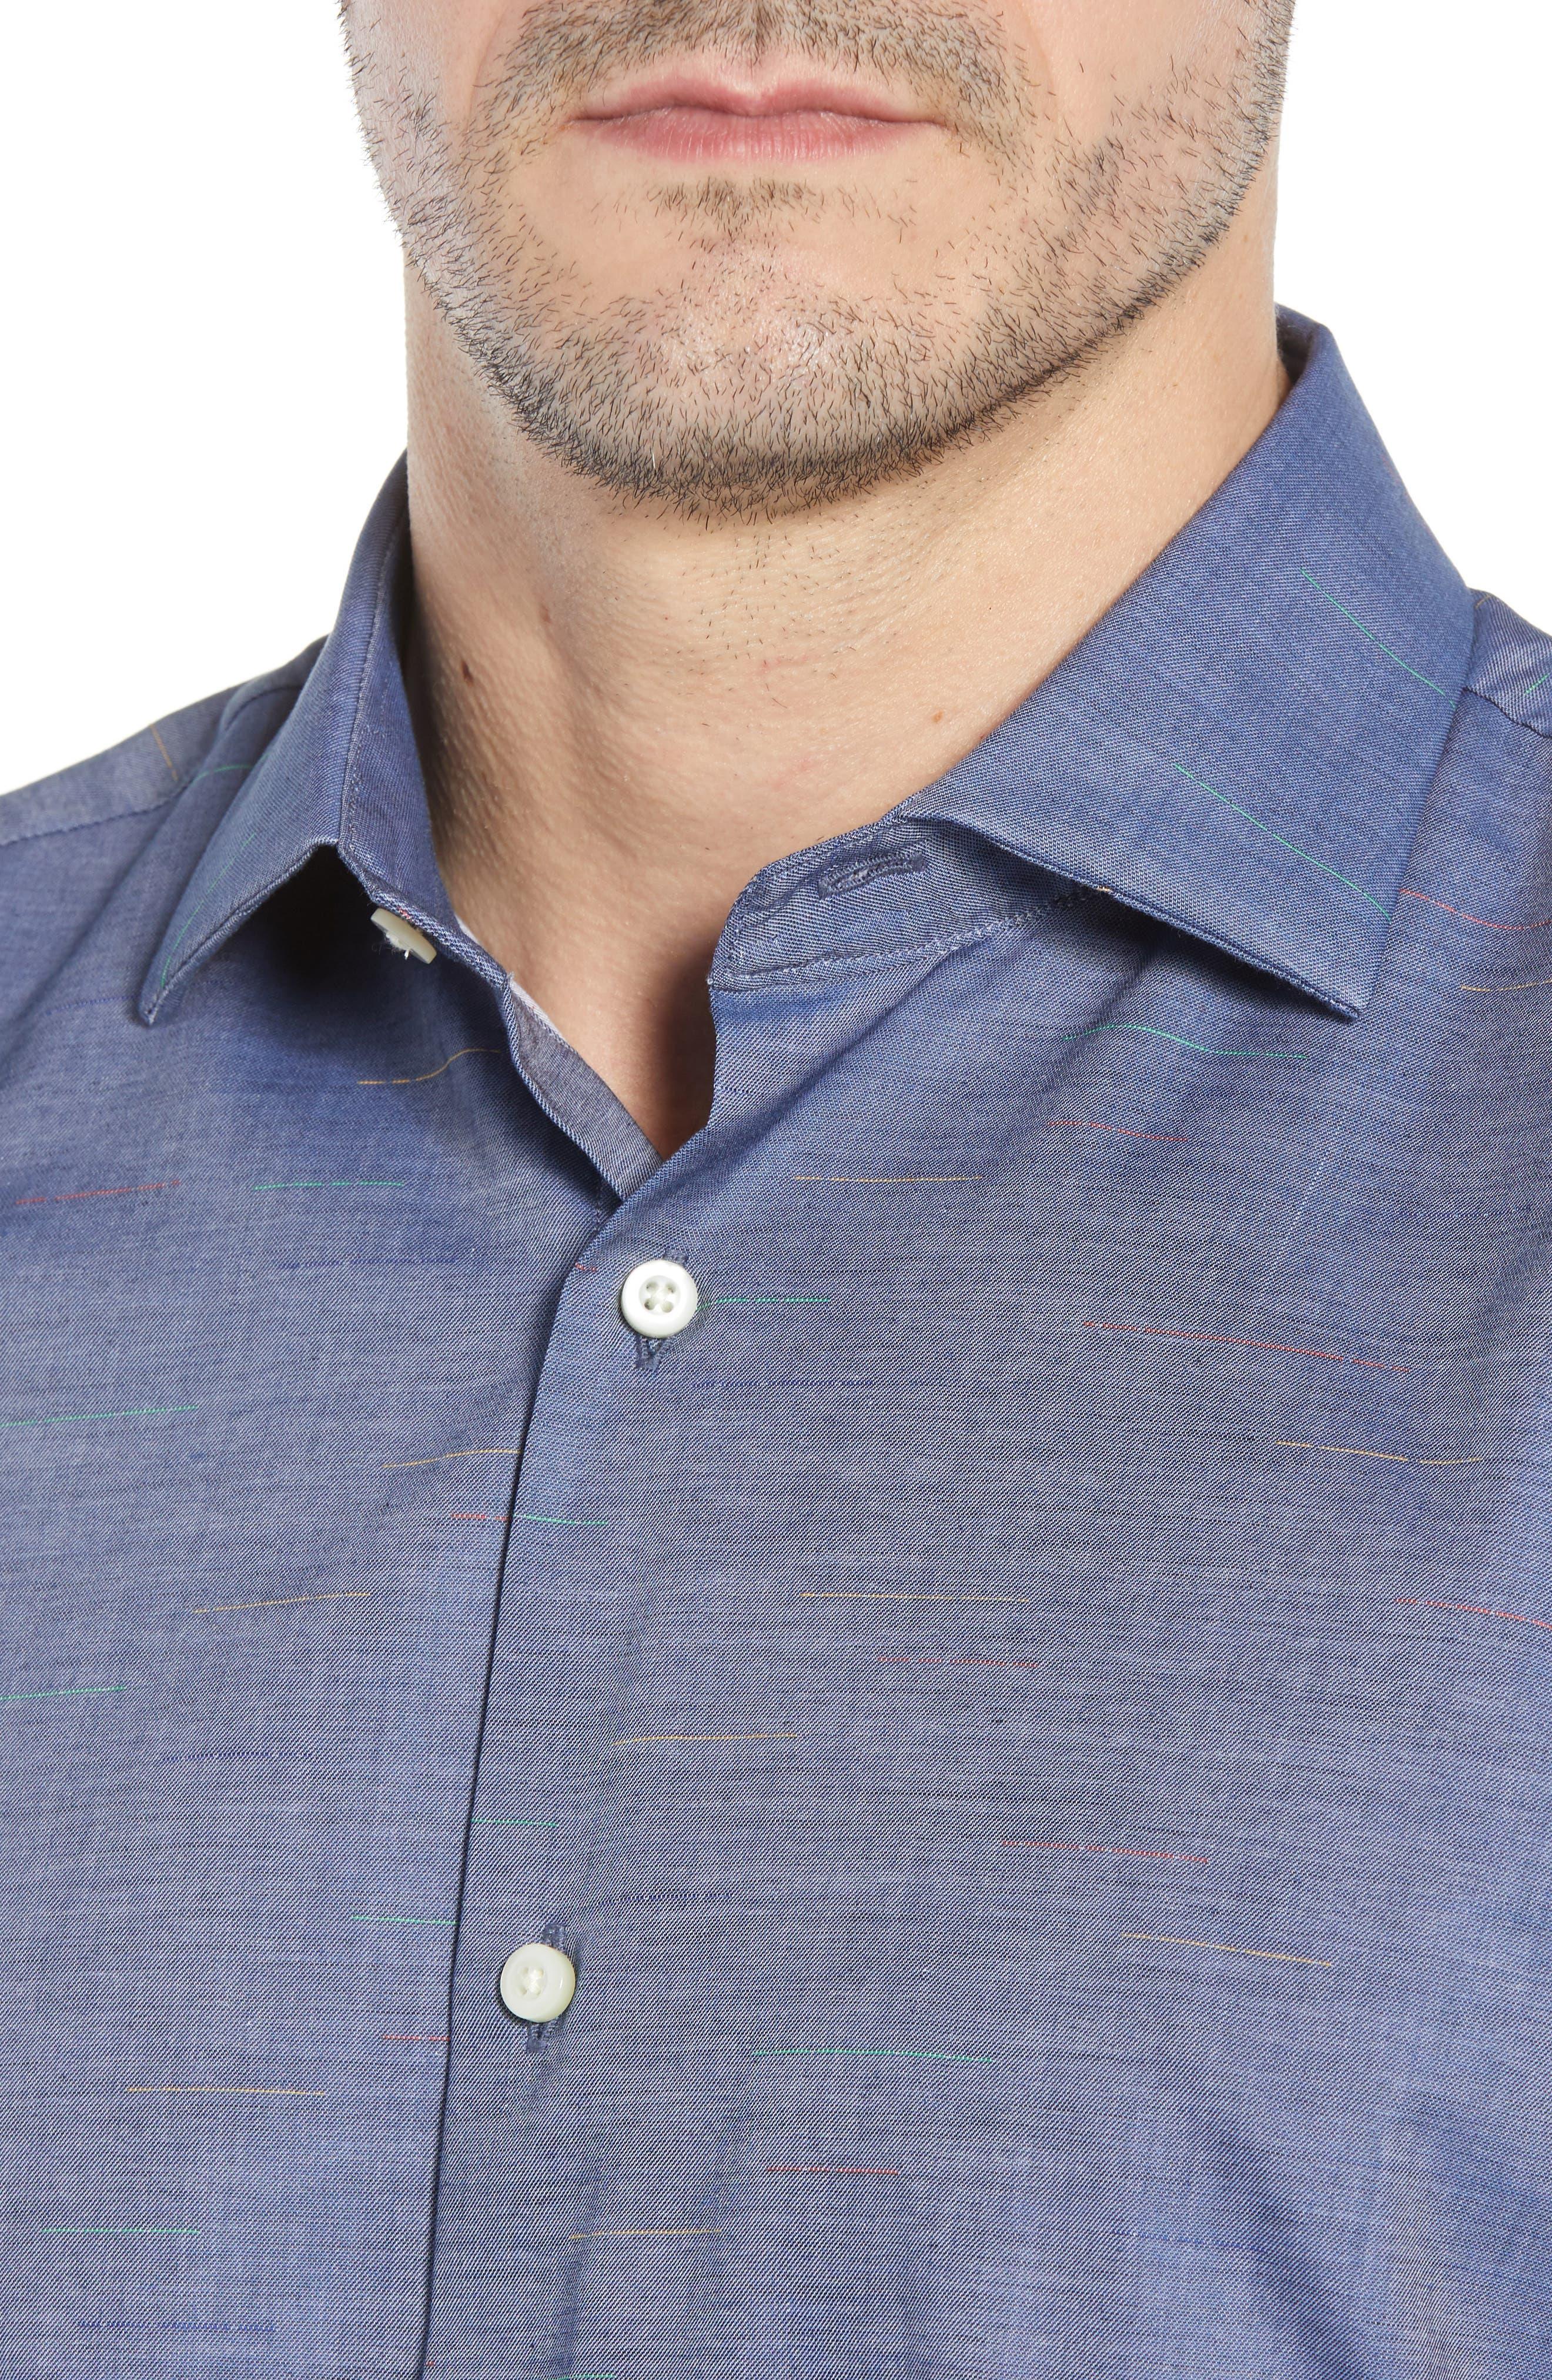 Regular Fit Chambray Sport Shirt,                             Alternate thumbnail 4, color,                             Blue